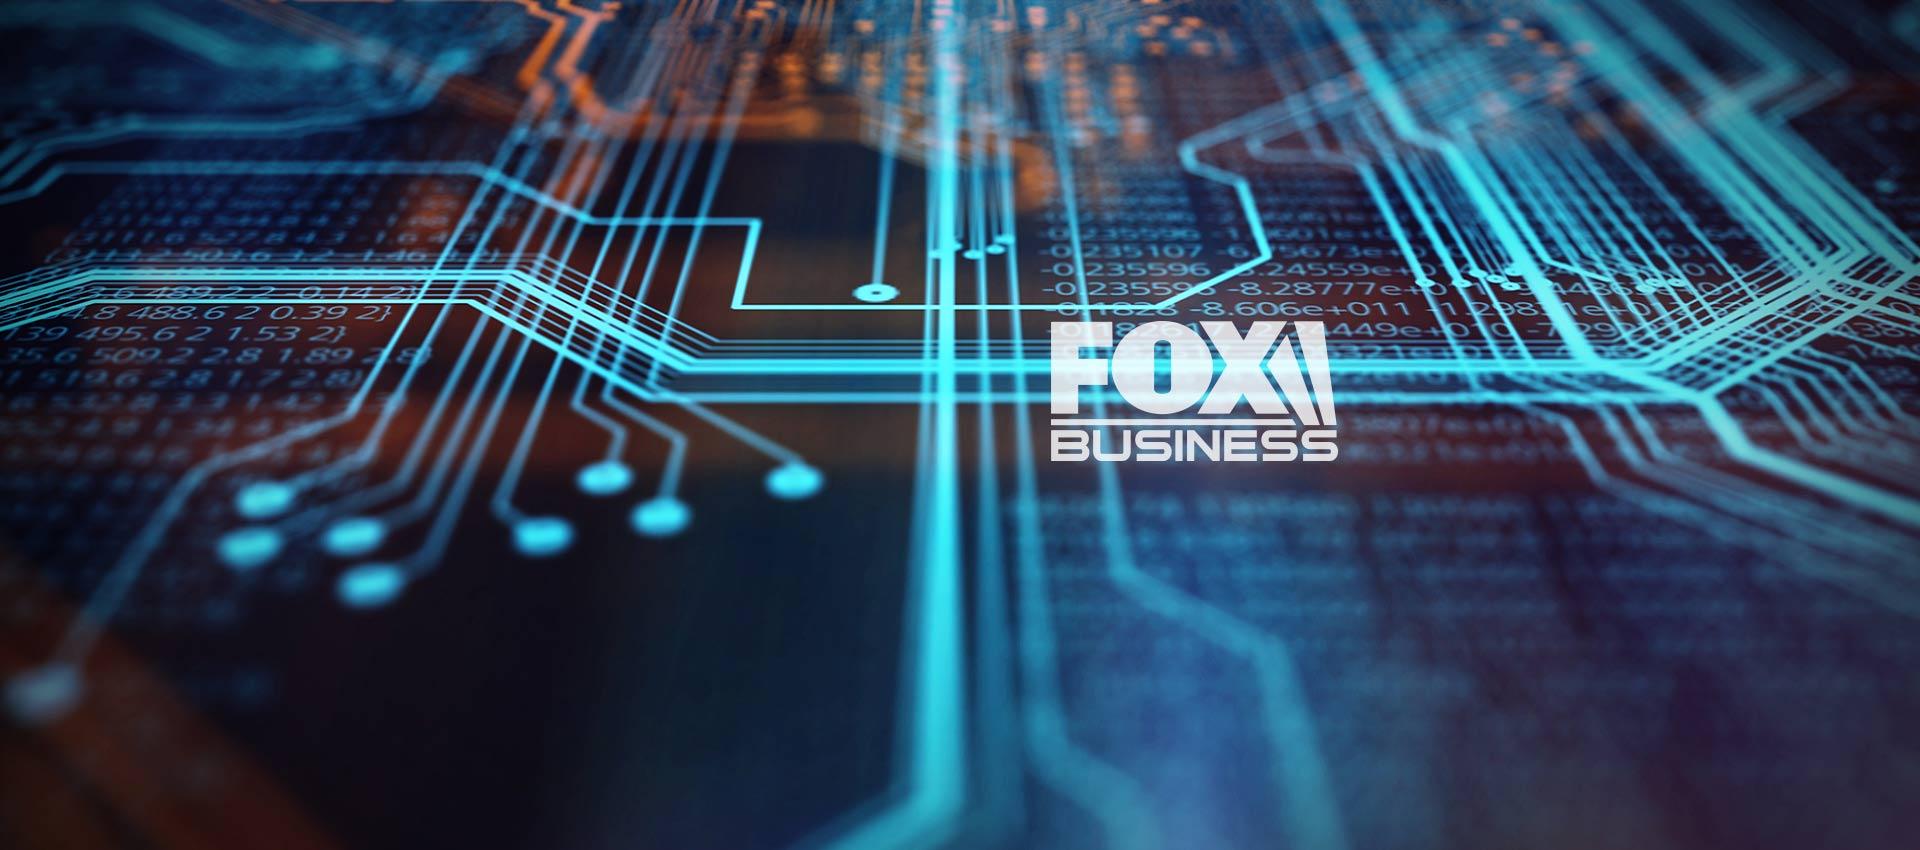 C3 IoT - Fox News - The Closing Bell